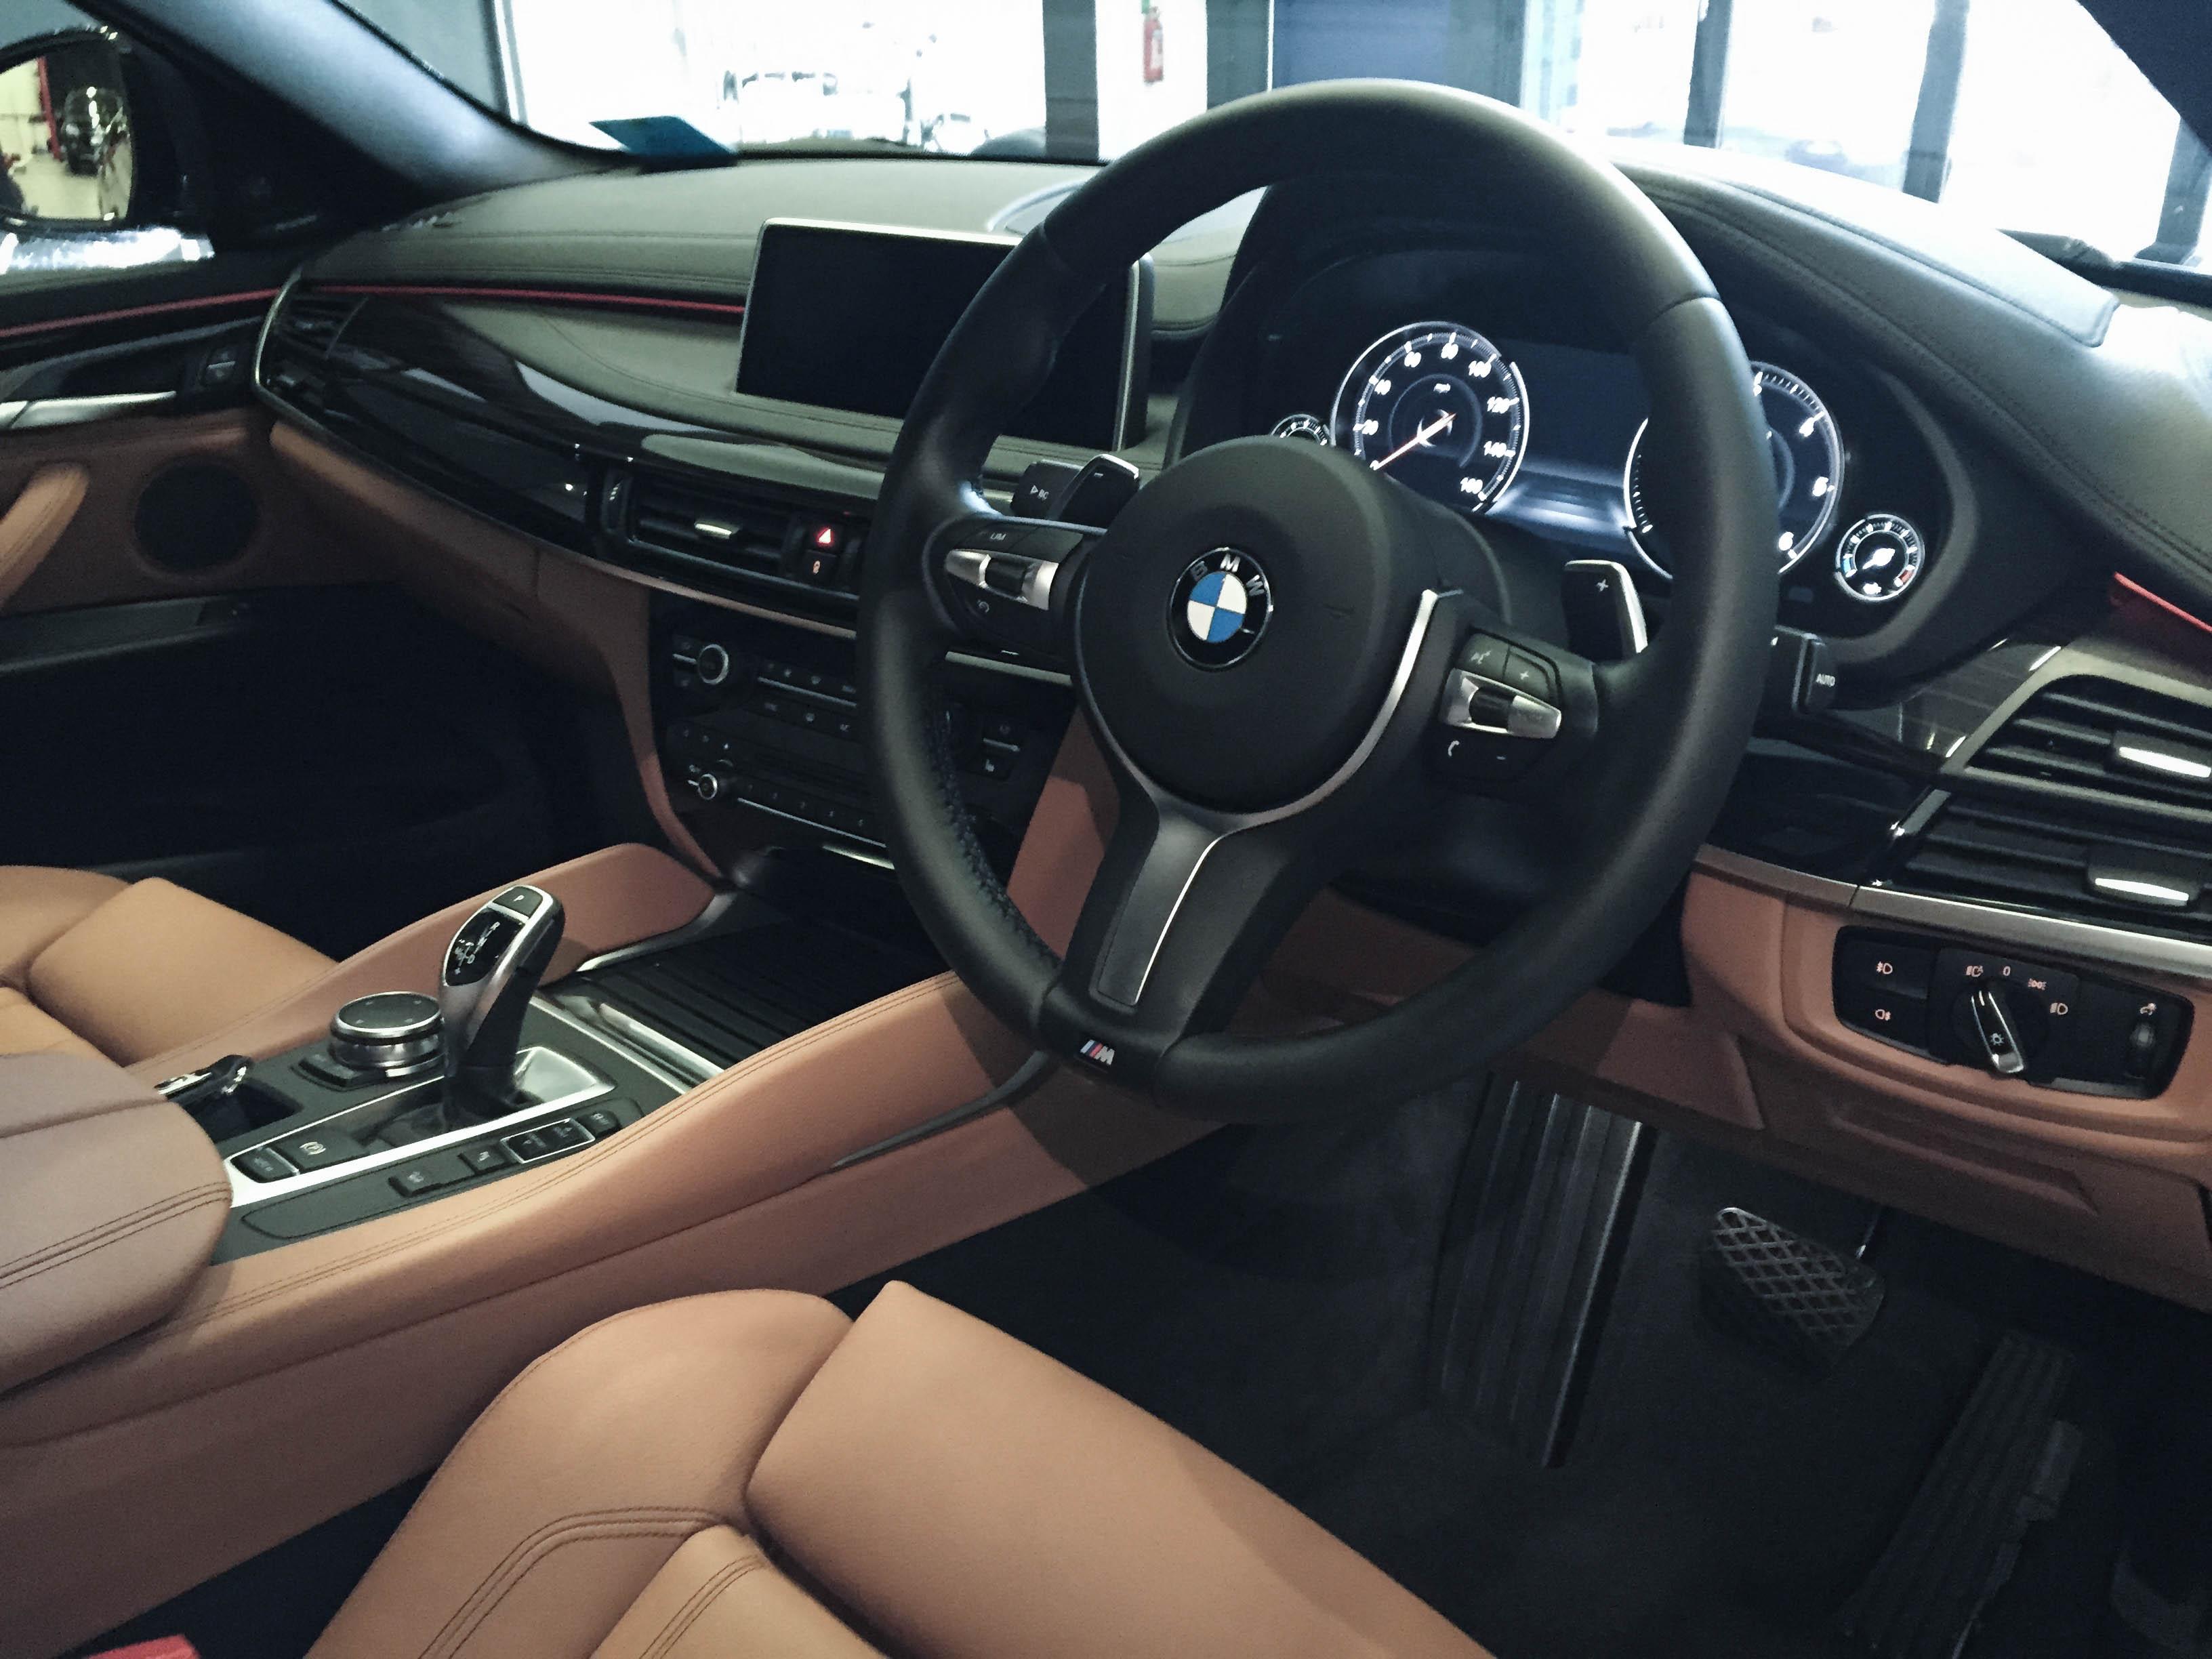 BMW X6 – Interior